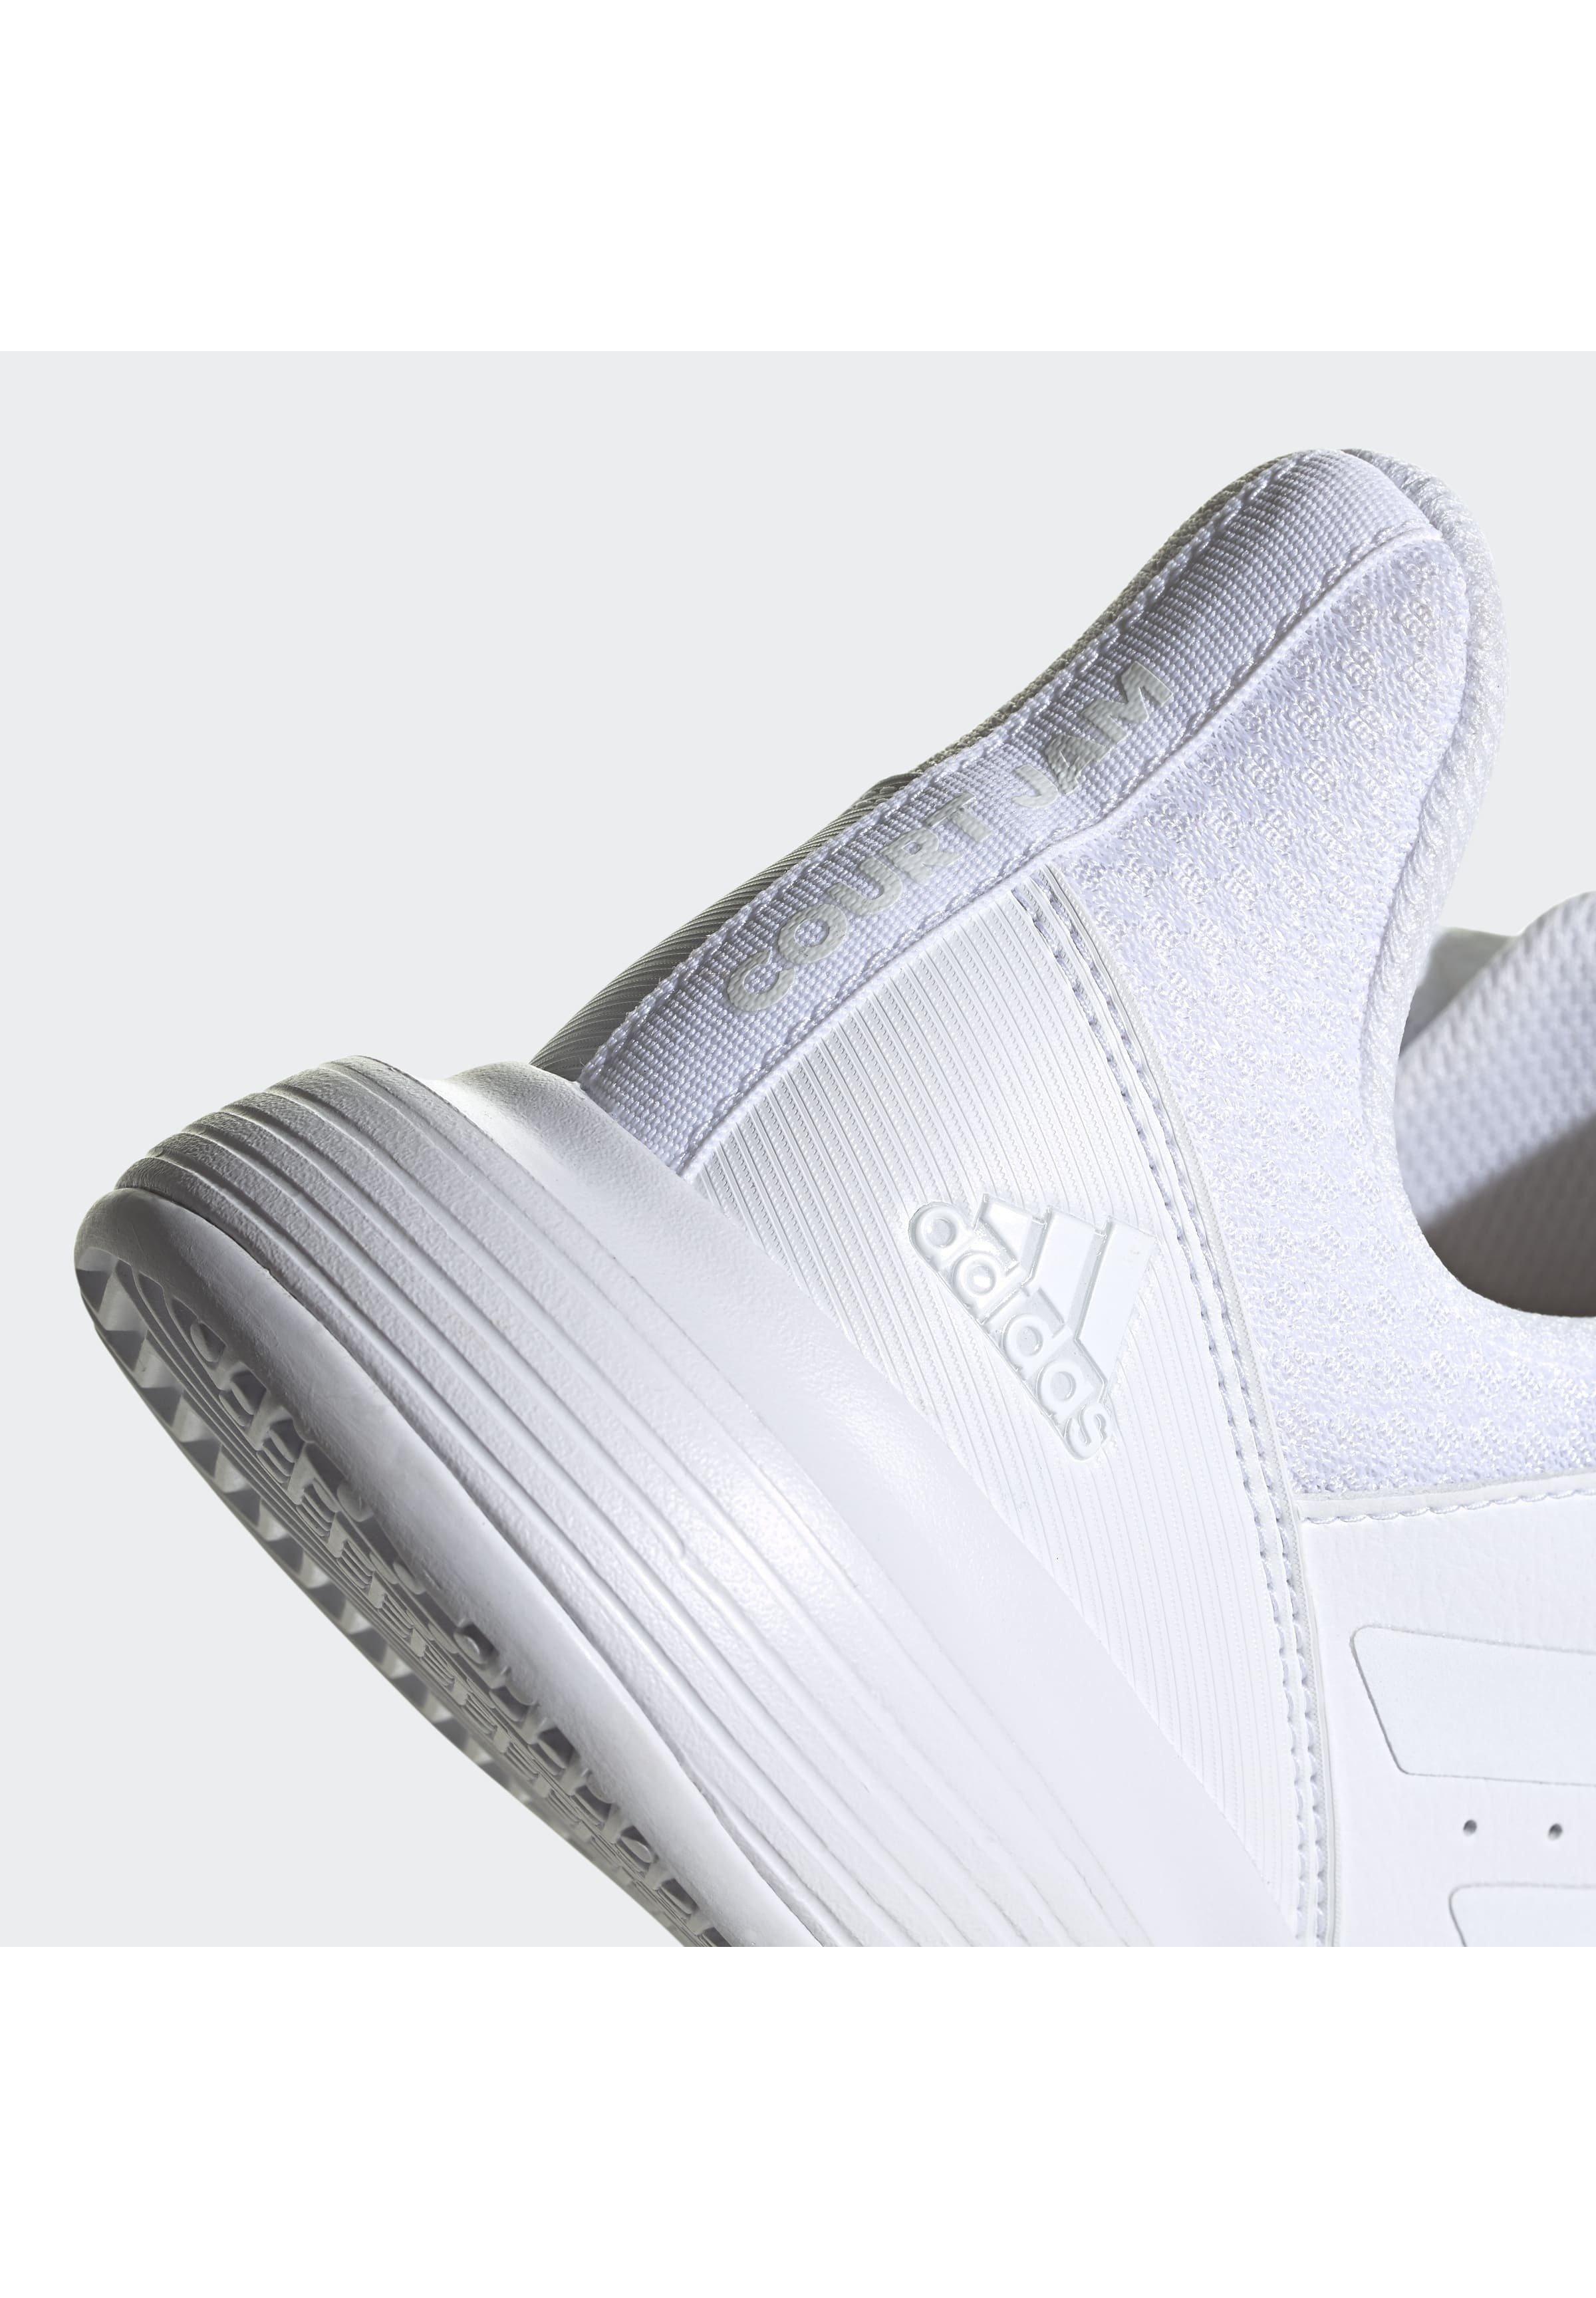 adidas Performance COURTJAM BOUNCE MULTICOURT LEATHER TENNIS SHOES - Multicourt Tennisschuh - white/weiß - Herrenschuhe WnyP2